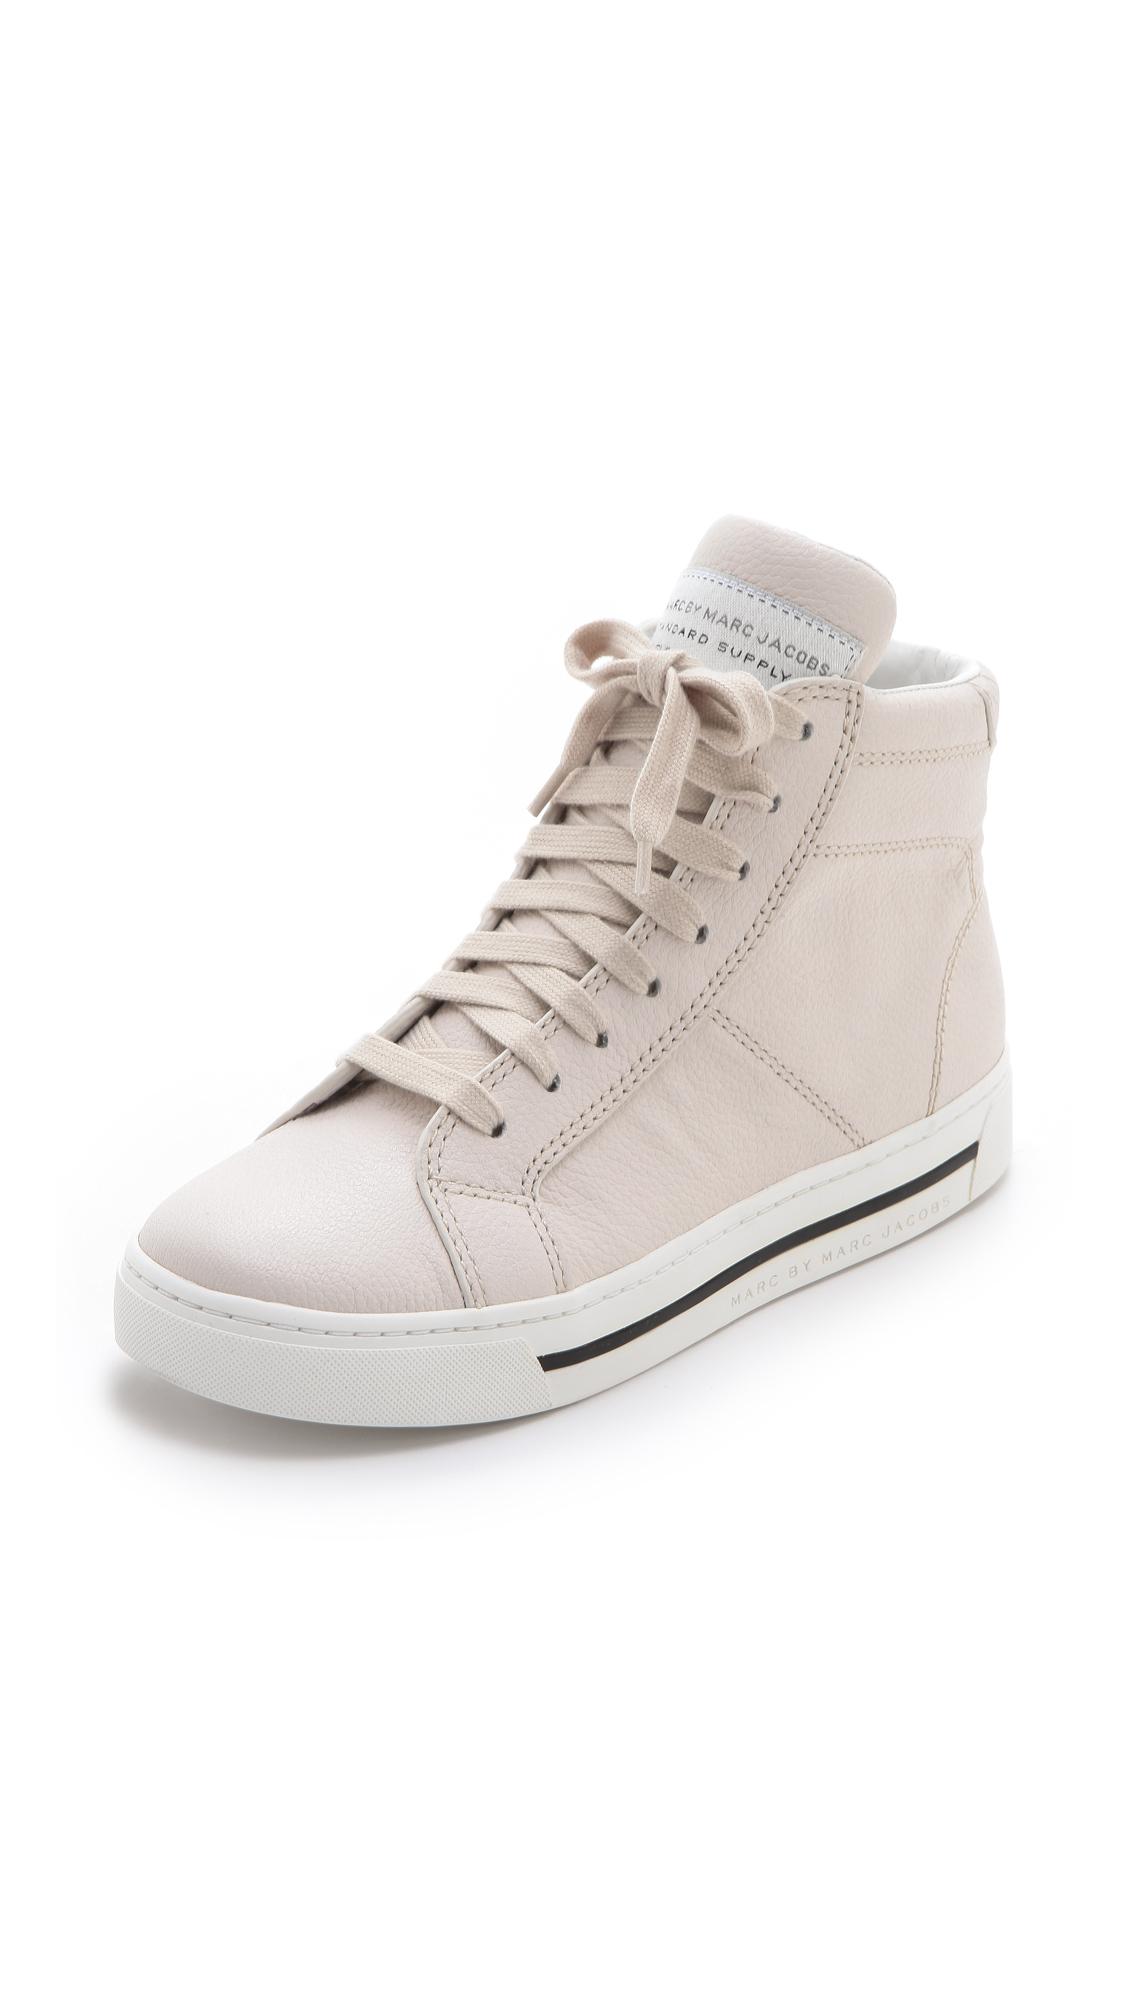 mode tidlös design kvalitet Marc by Marc Jacobs High Top Sneakers | SHOPBOP